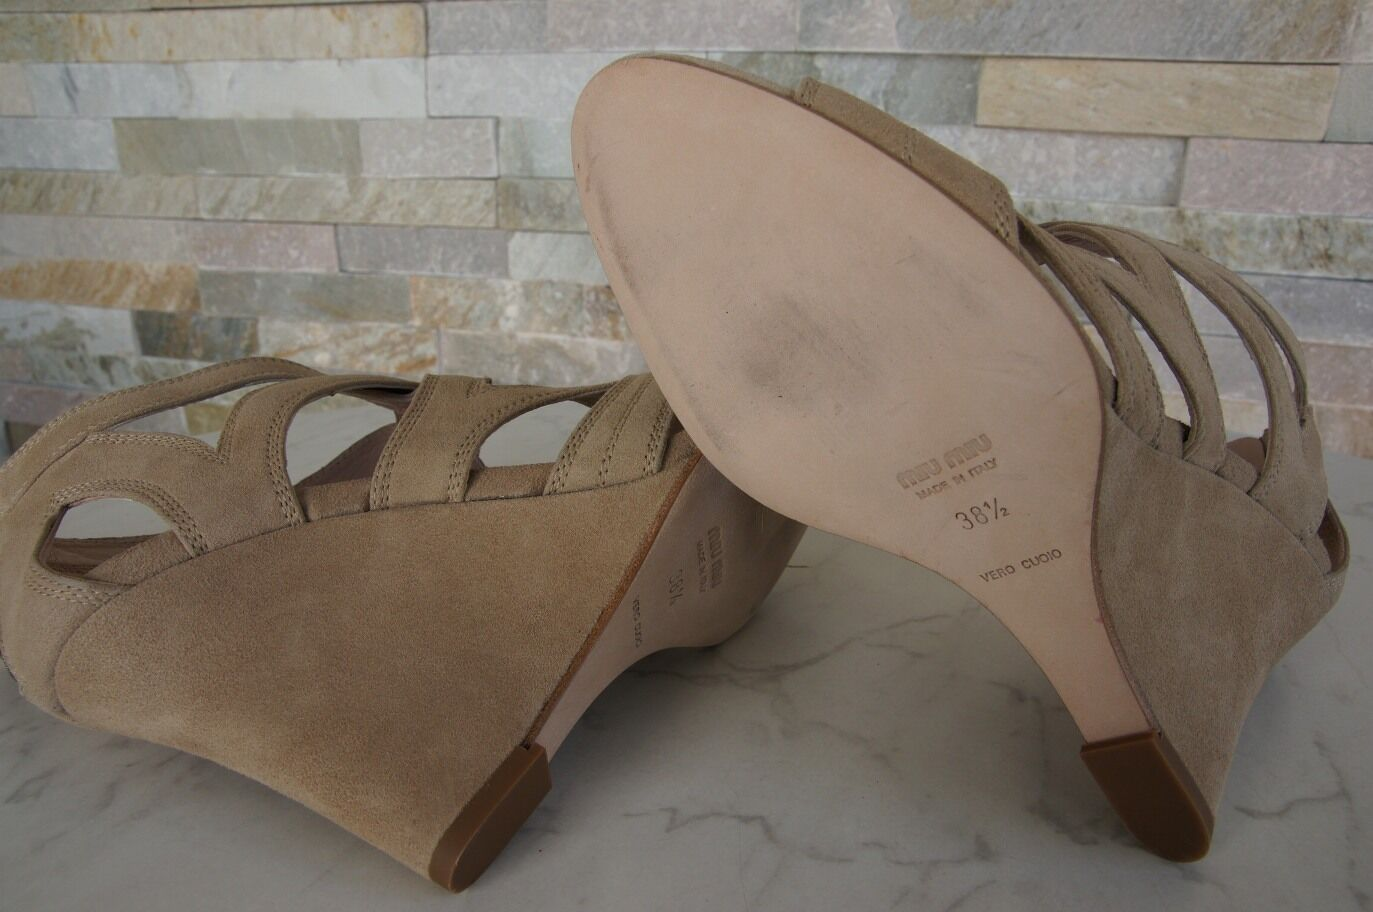 Orig MIU Sandaletten MIU Gr 41 Keil Sandaletten MIU Sandales Wedges Schuhe schuhe sand NEU f4aad9